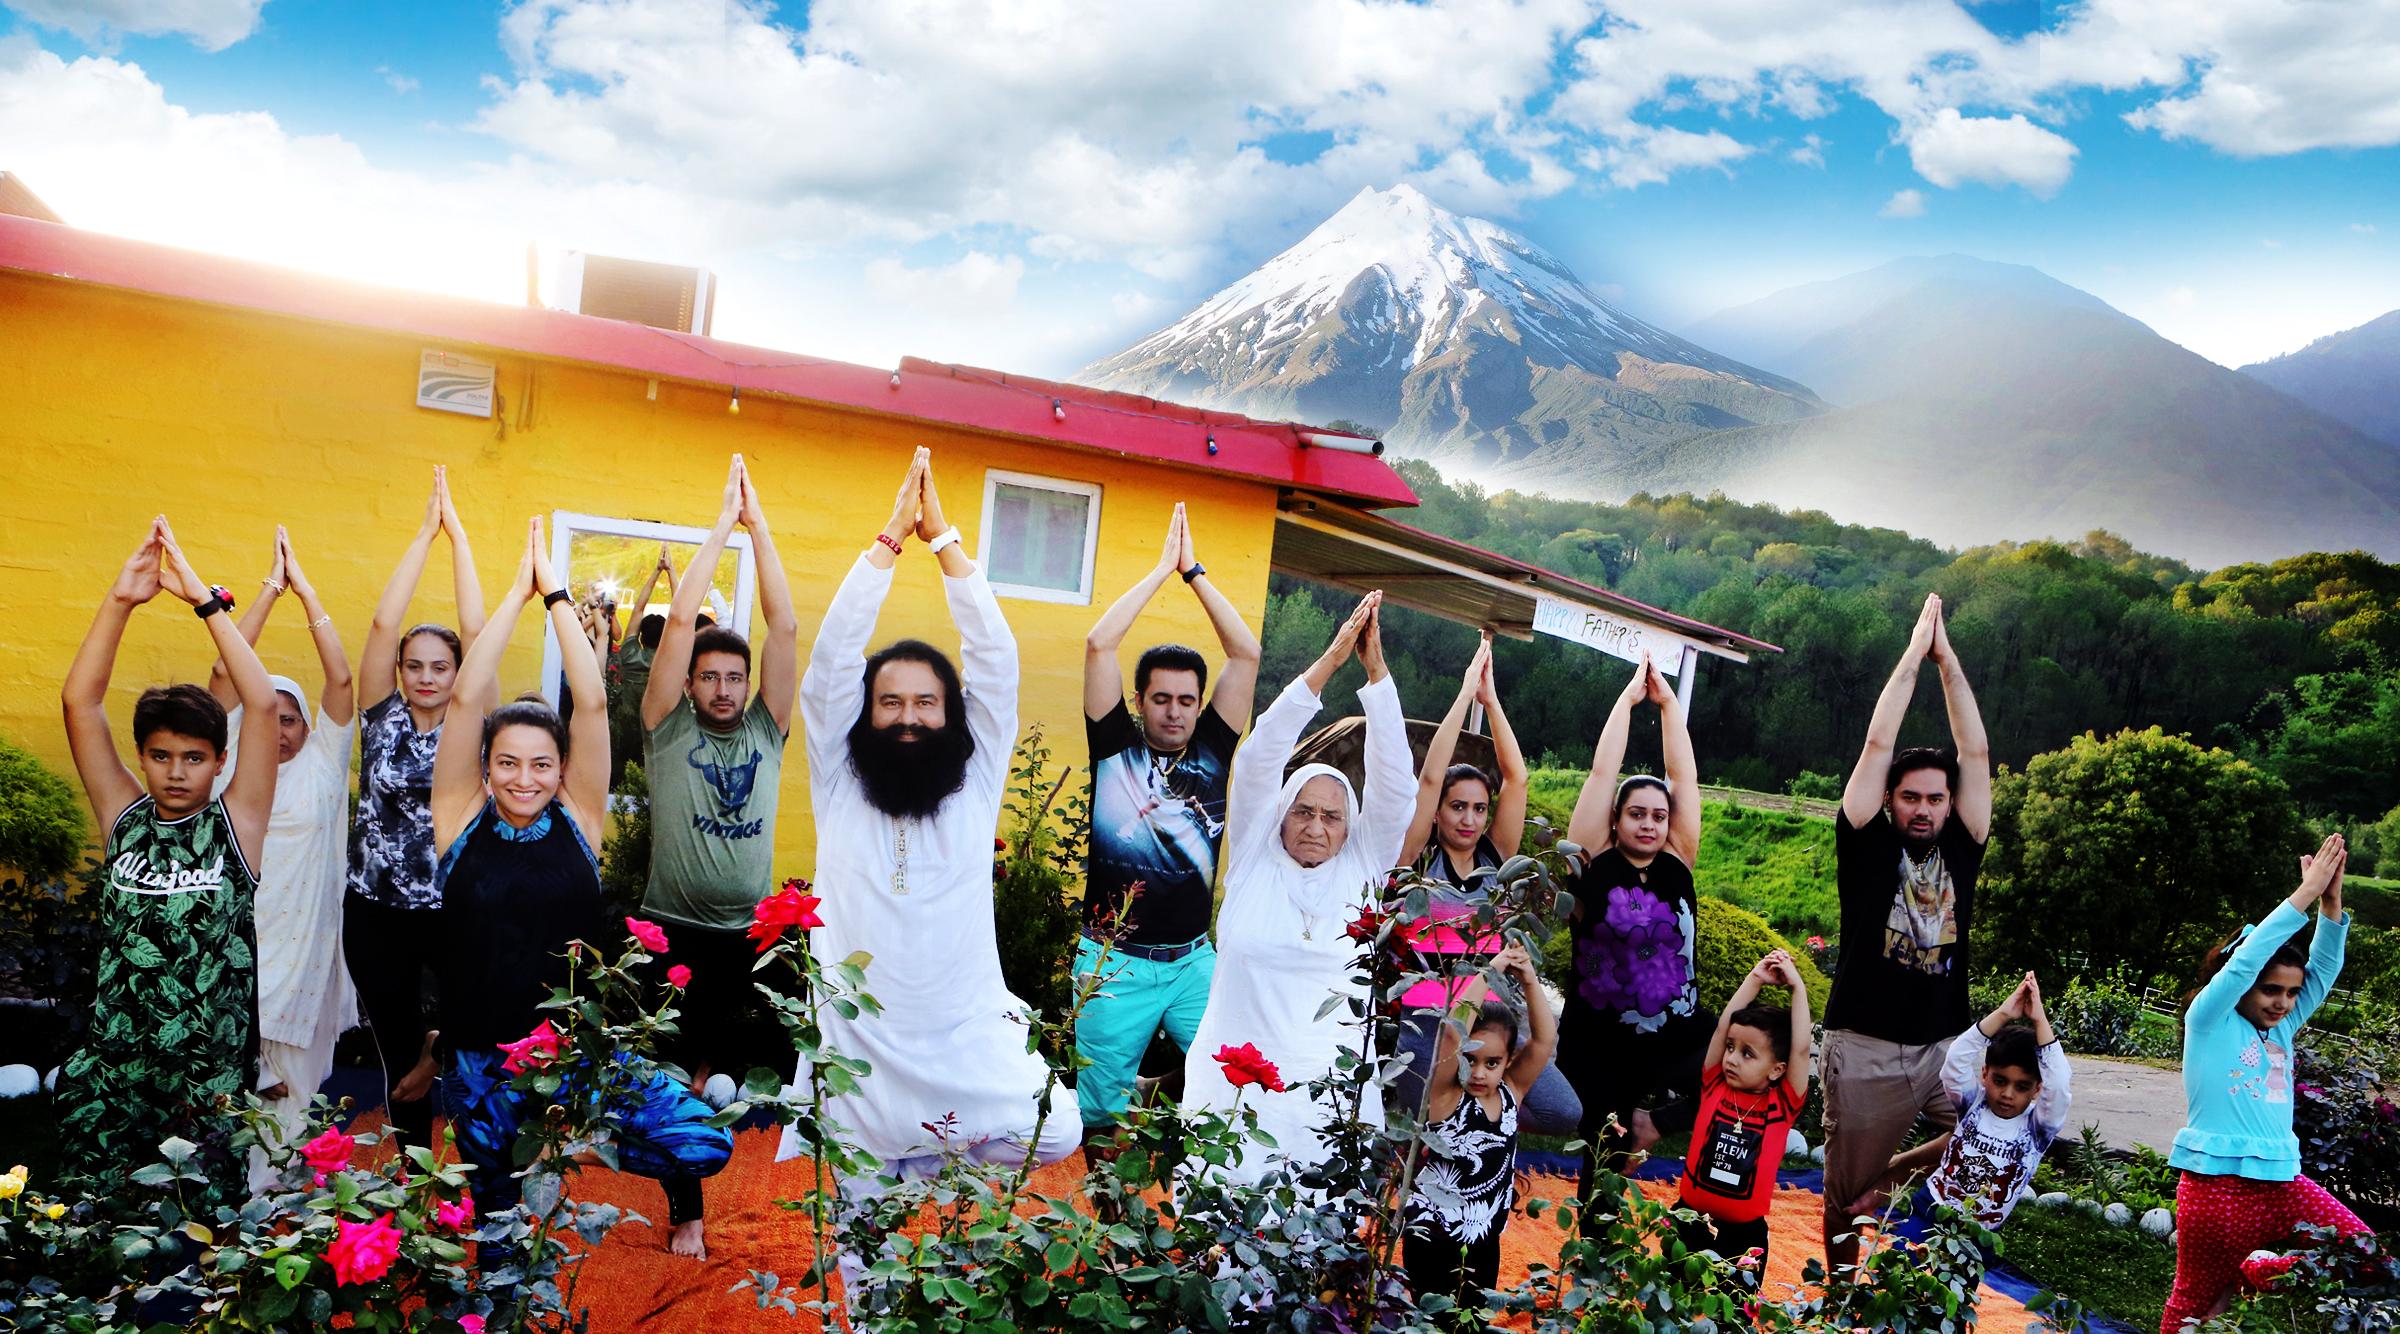 Yoga Day, Gurmeet Ram Rahim, Narendra Modi, Health, HoneyPreet Insan